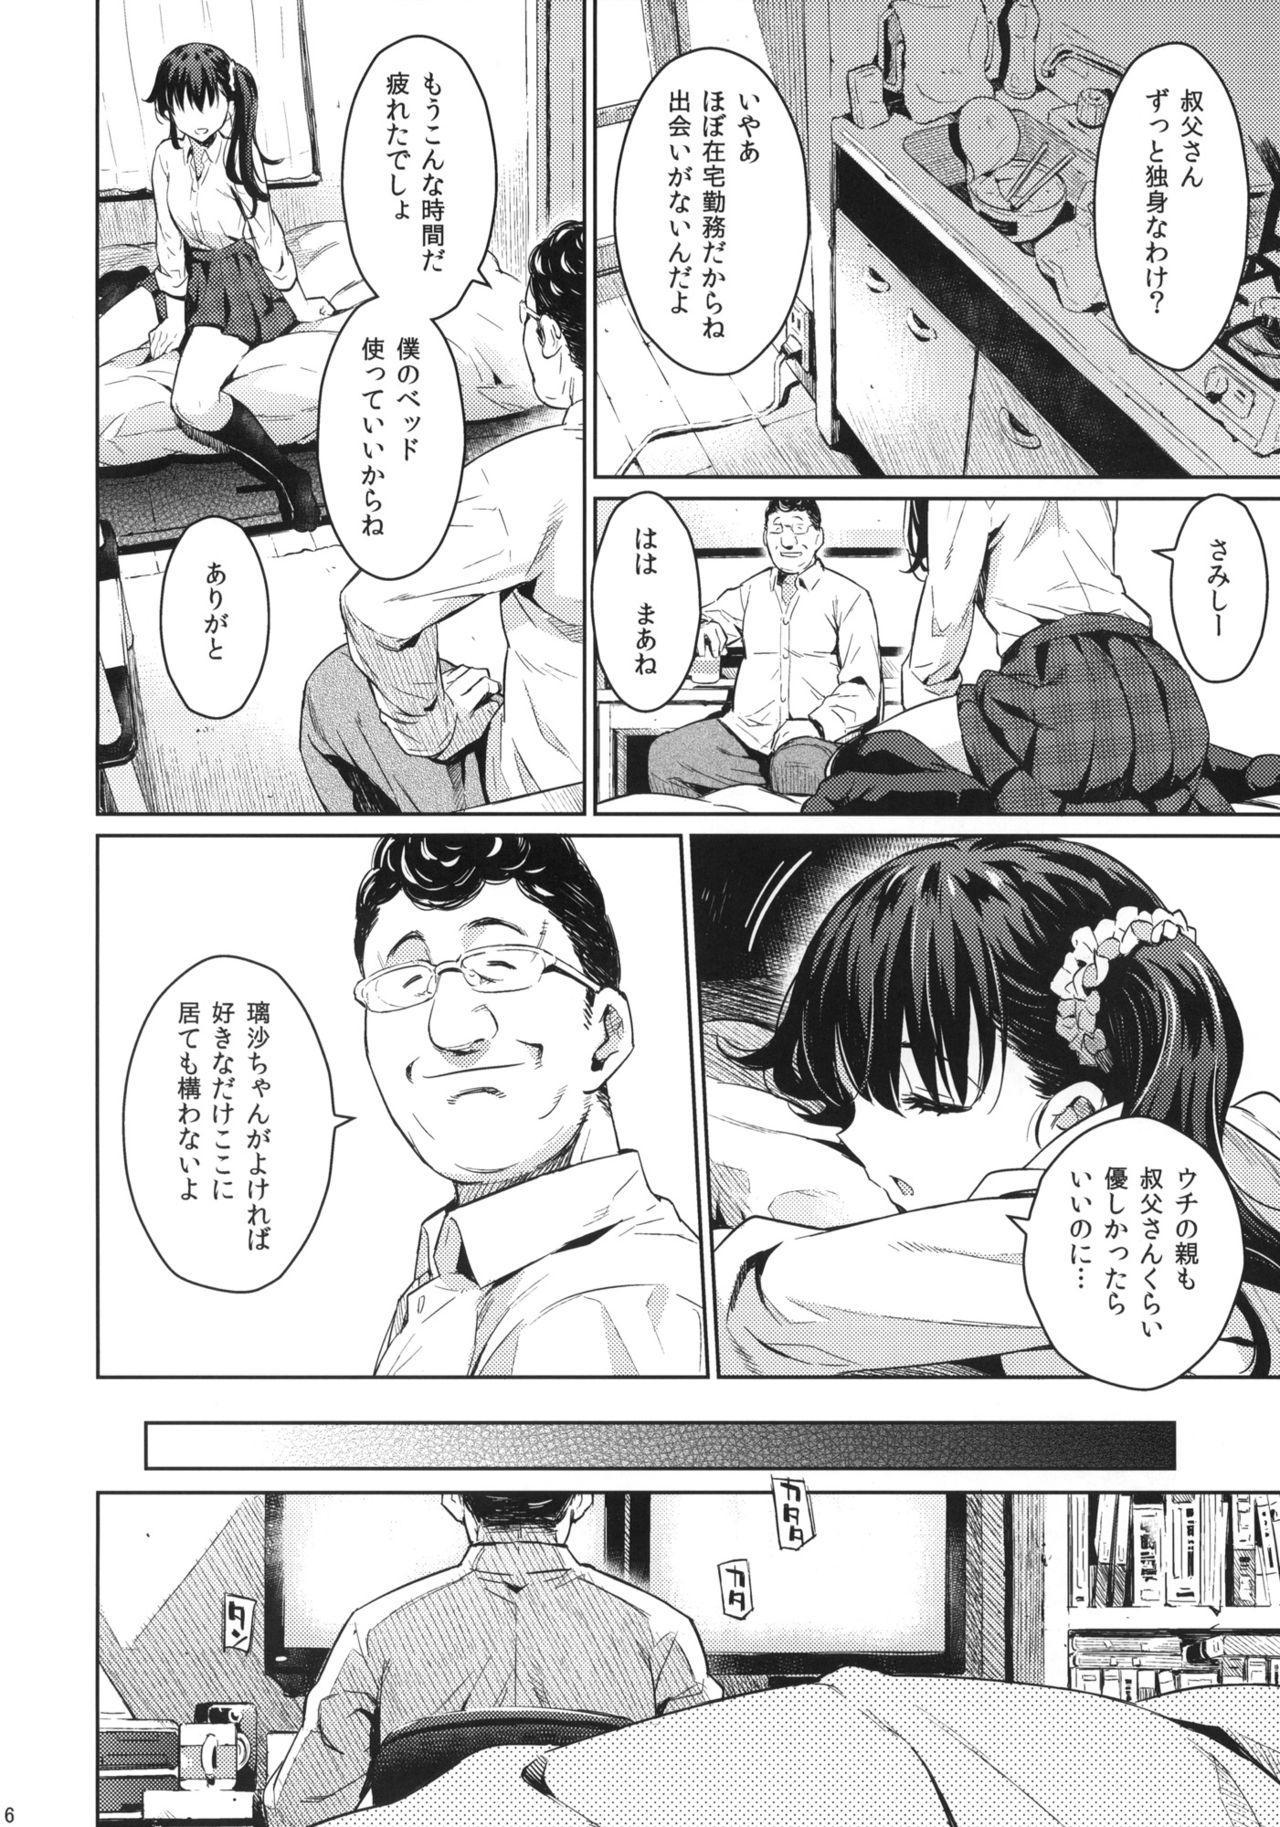 Kowaremono:Risa + Paper 4